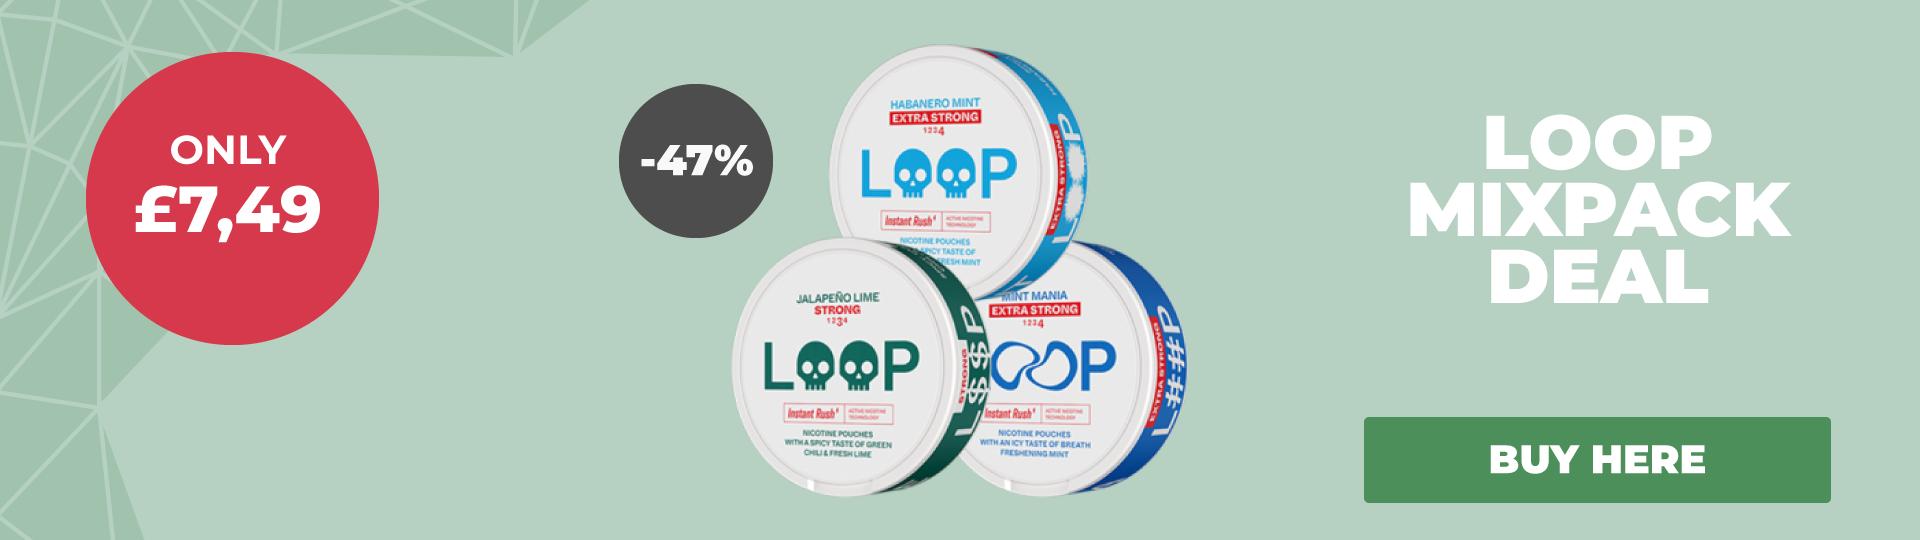 LOOP Mixpack